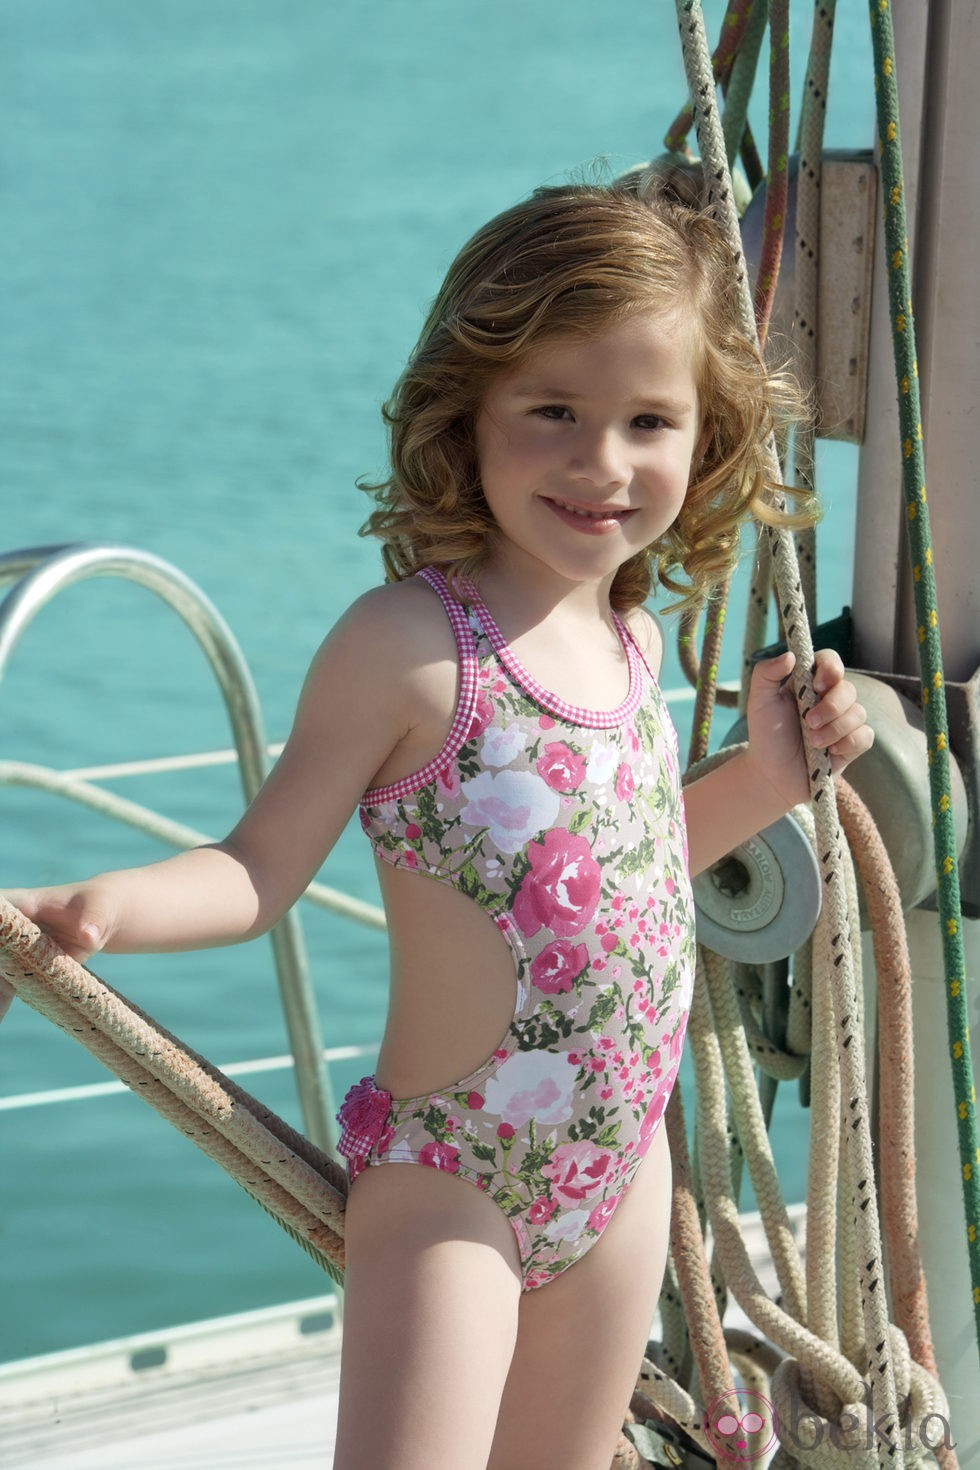 Compras de navidad bikini store 3 - 1 part 10